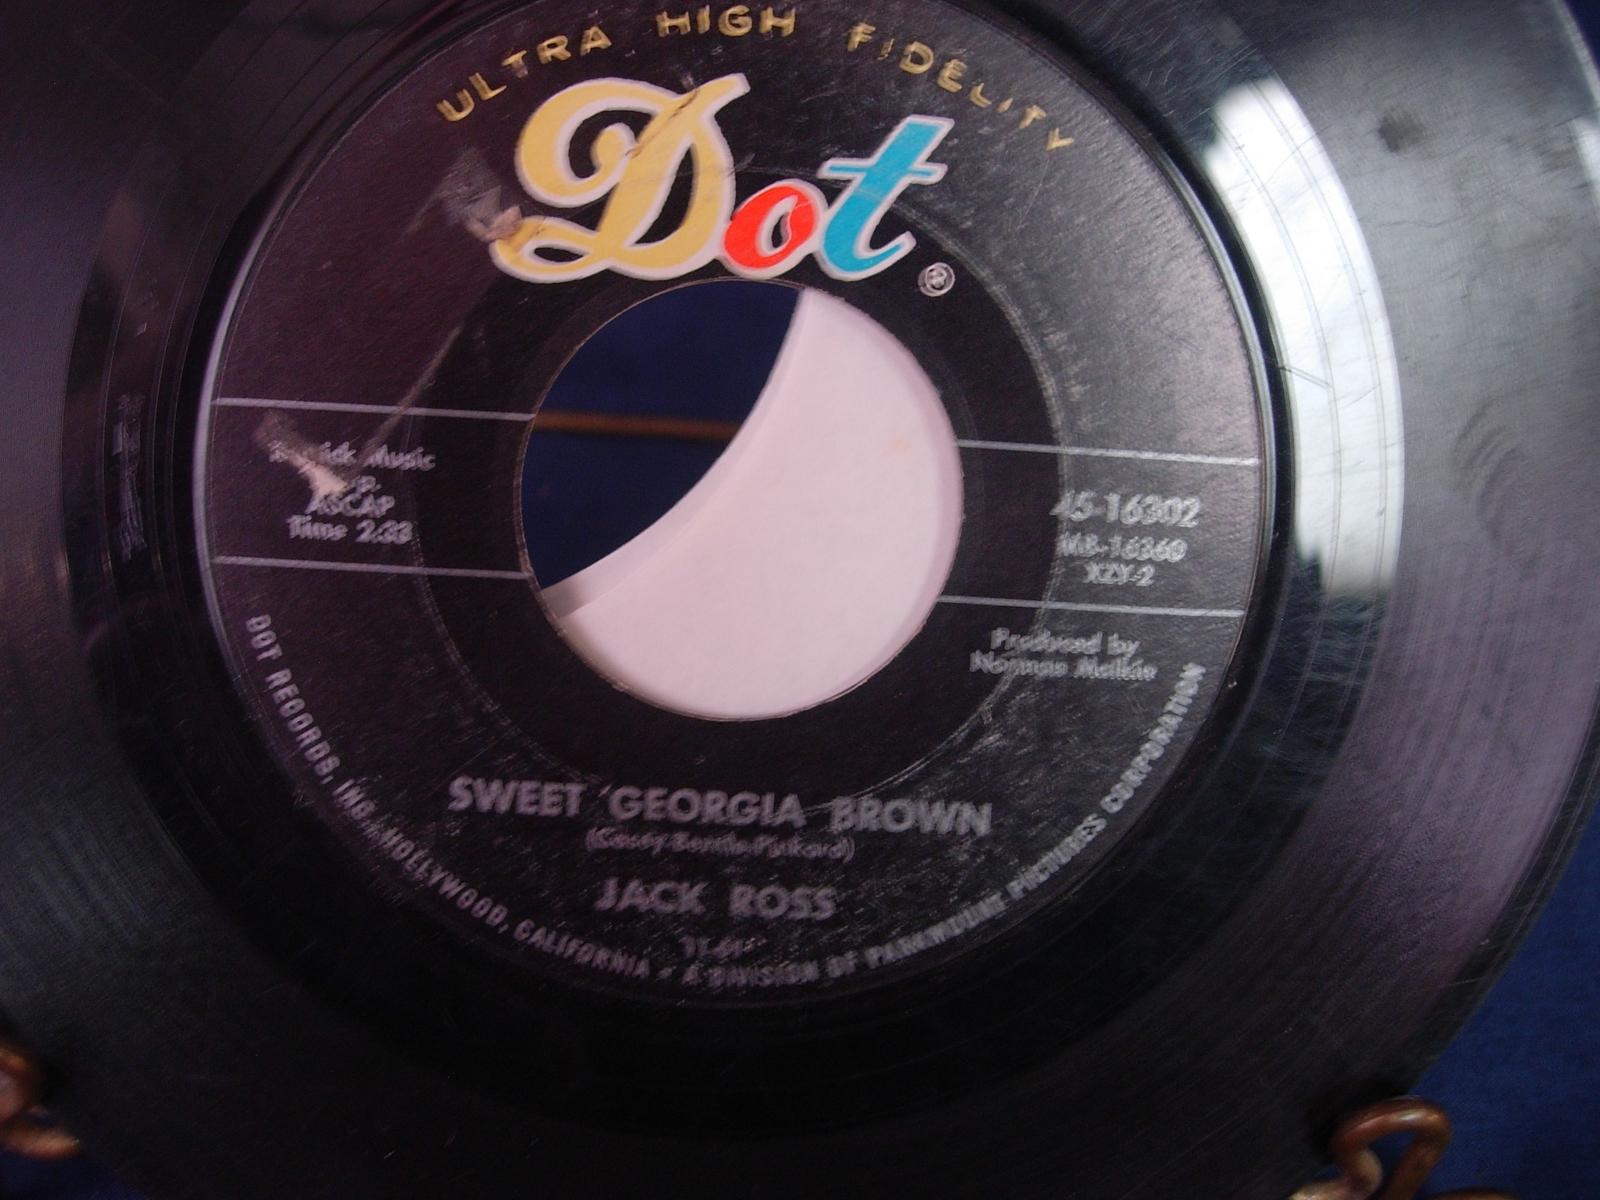 JACK ROSS Happy Jose / Sweet Georgia Brown - Dot 16302